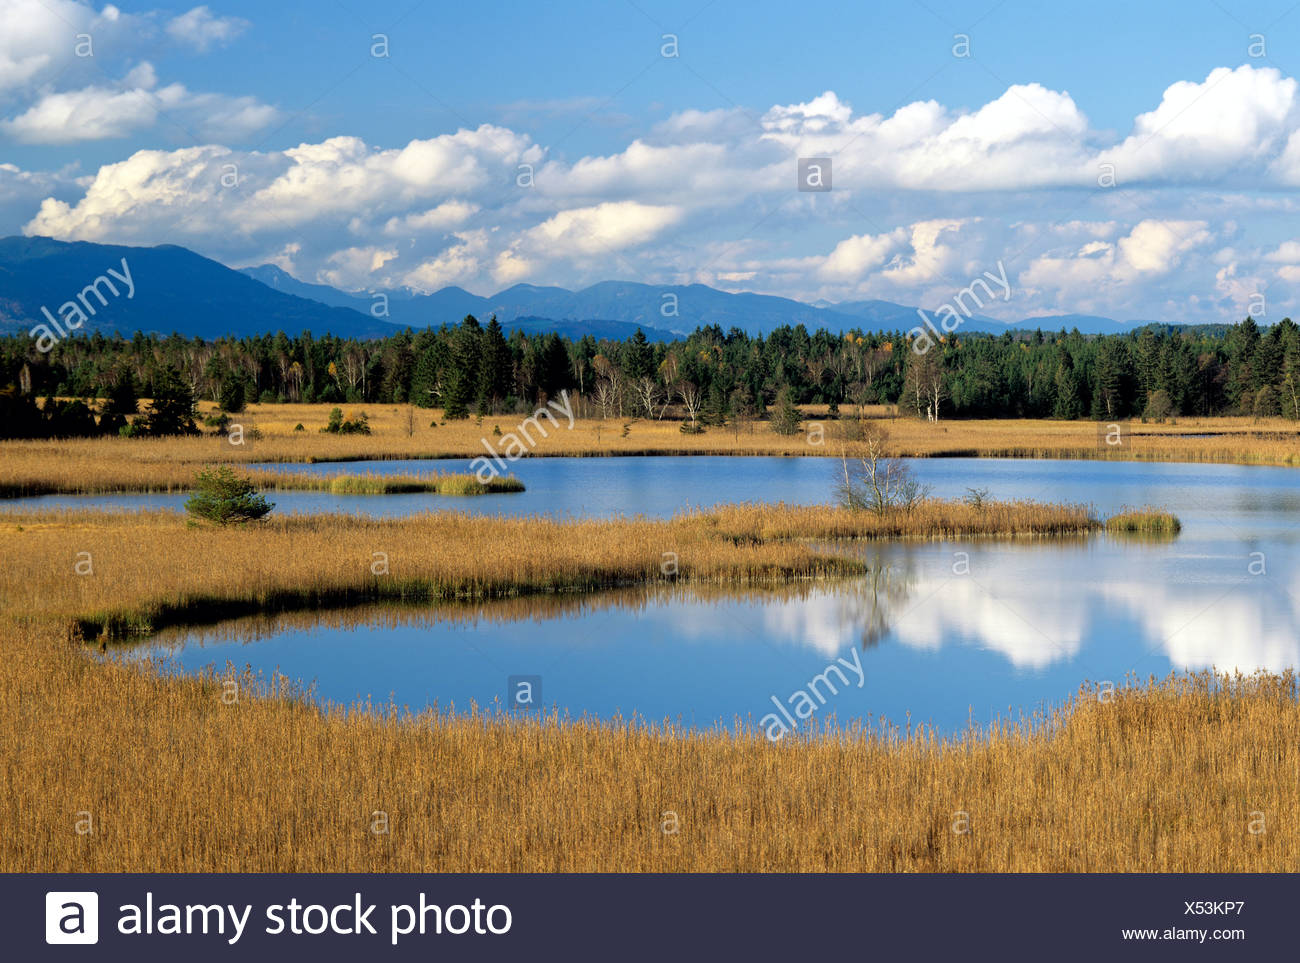 Grosser Gartensee lake, Osterseen lakes in Seeshaupt, Upper Bavaria, Bavaria, Germany, Europe Stock Photo